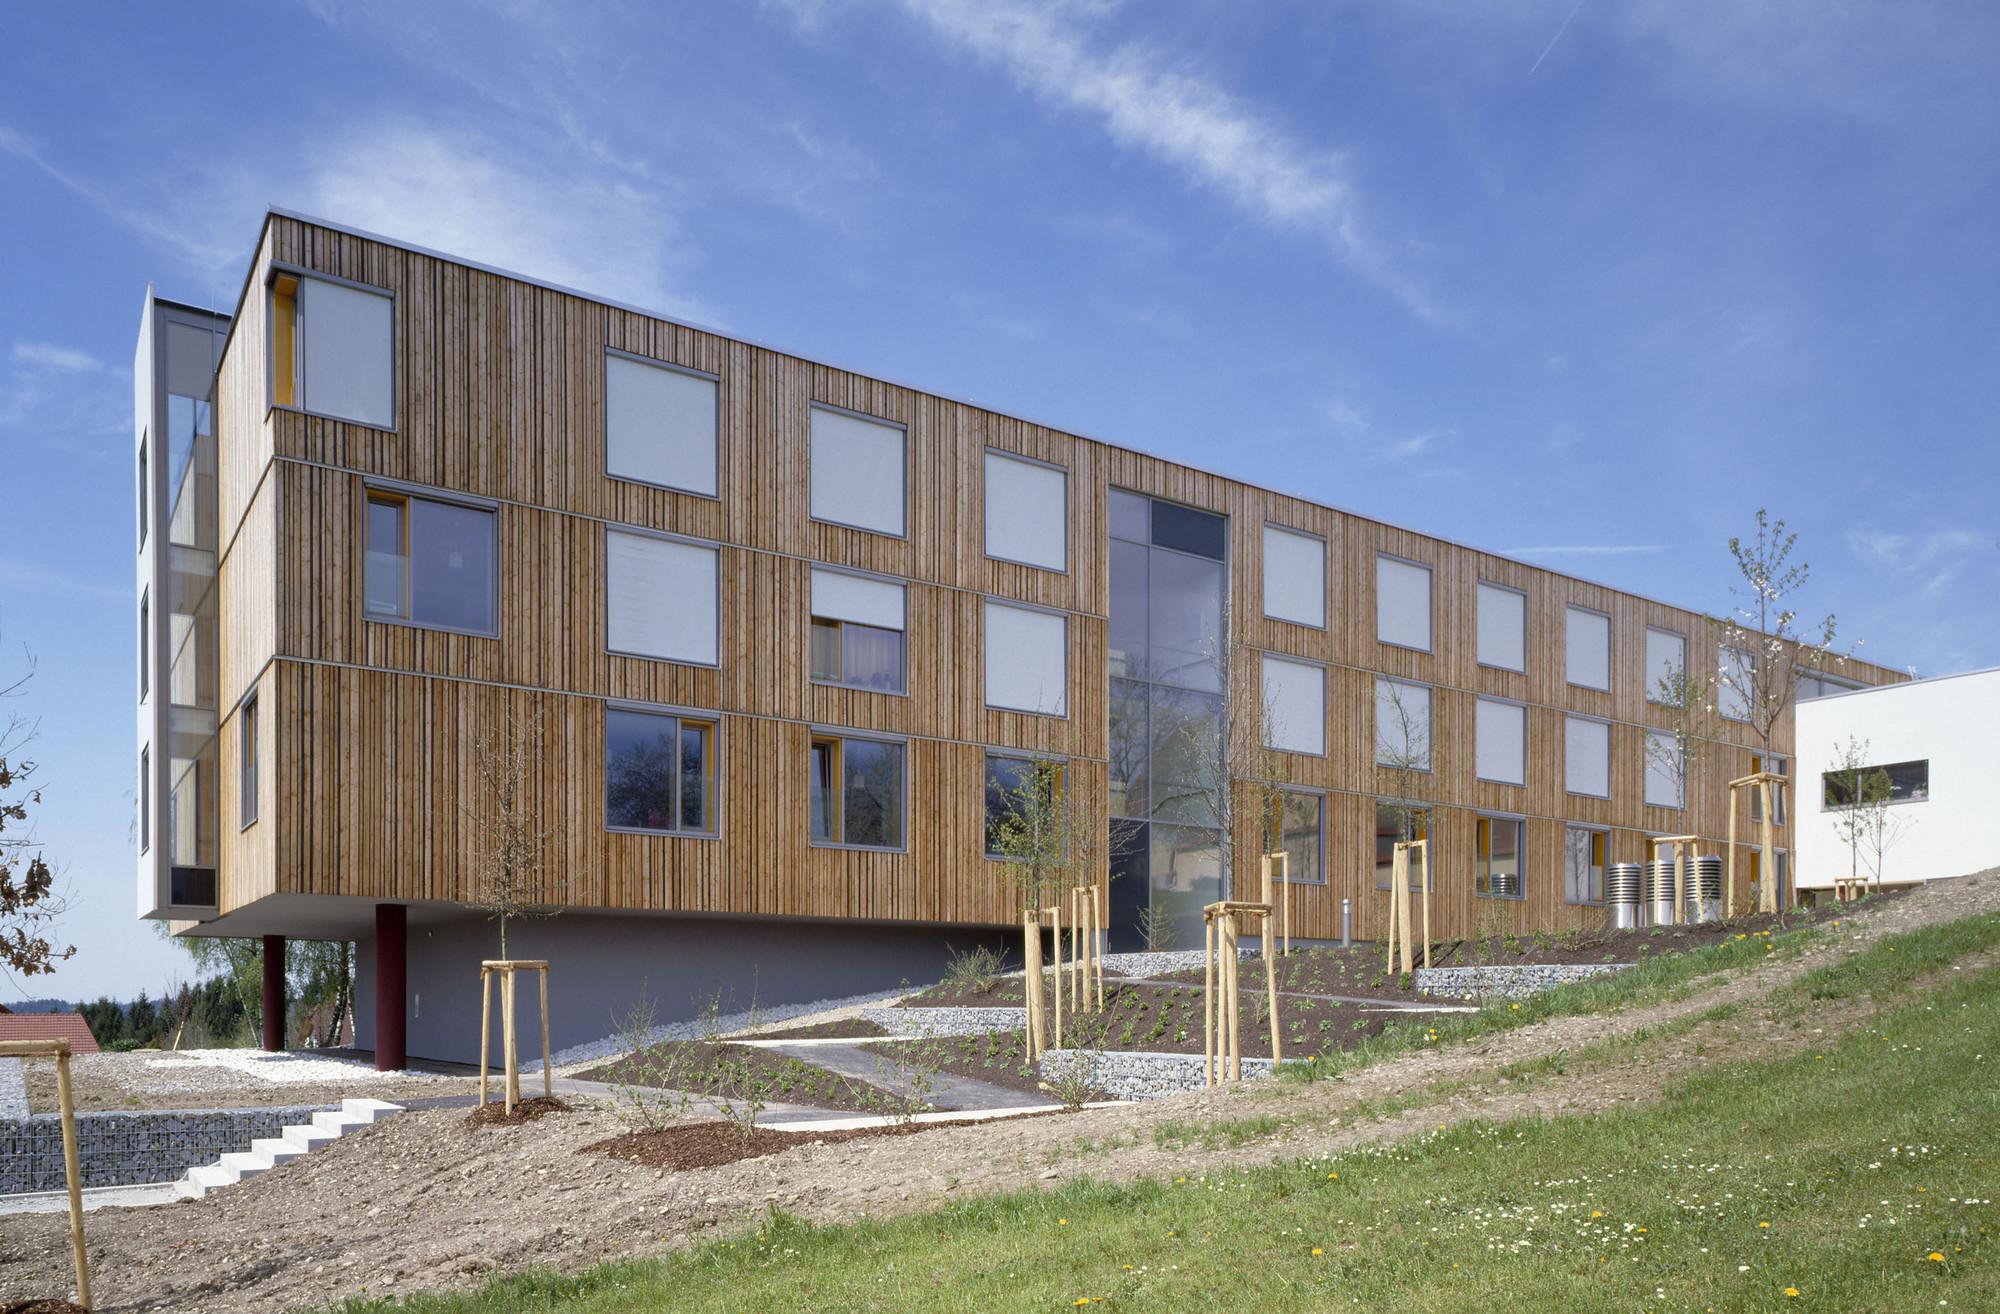 Asilo de ancianos g rtner neururer plataforma arquitectura Nursing home architecture